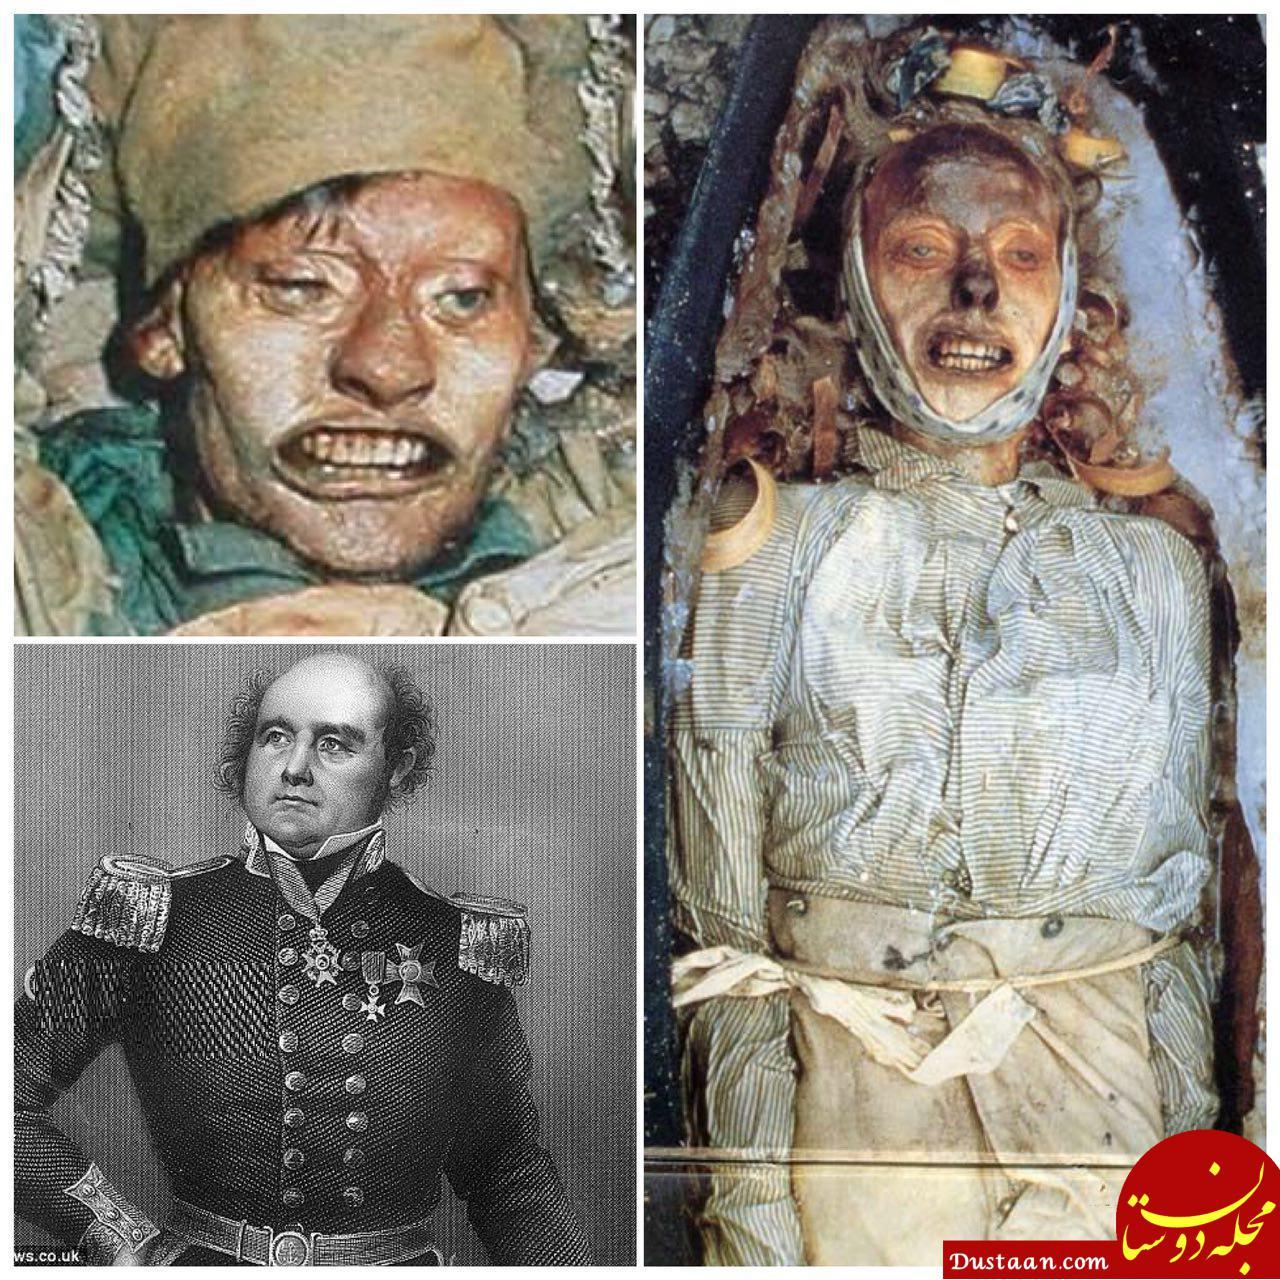 www.dustaan.com کشف جسد یخ زده پس از 150 سال! +عکس